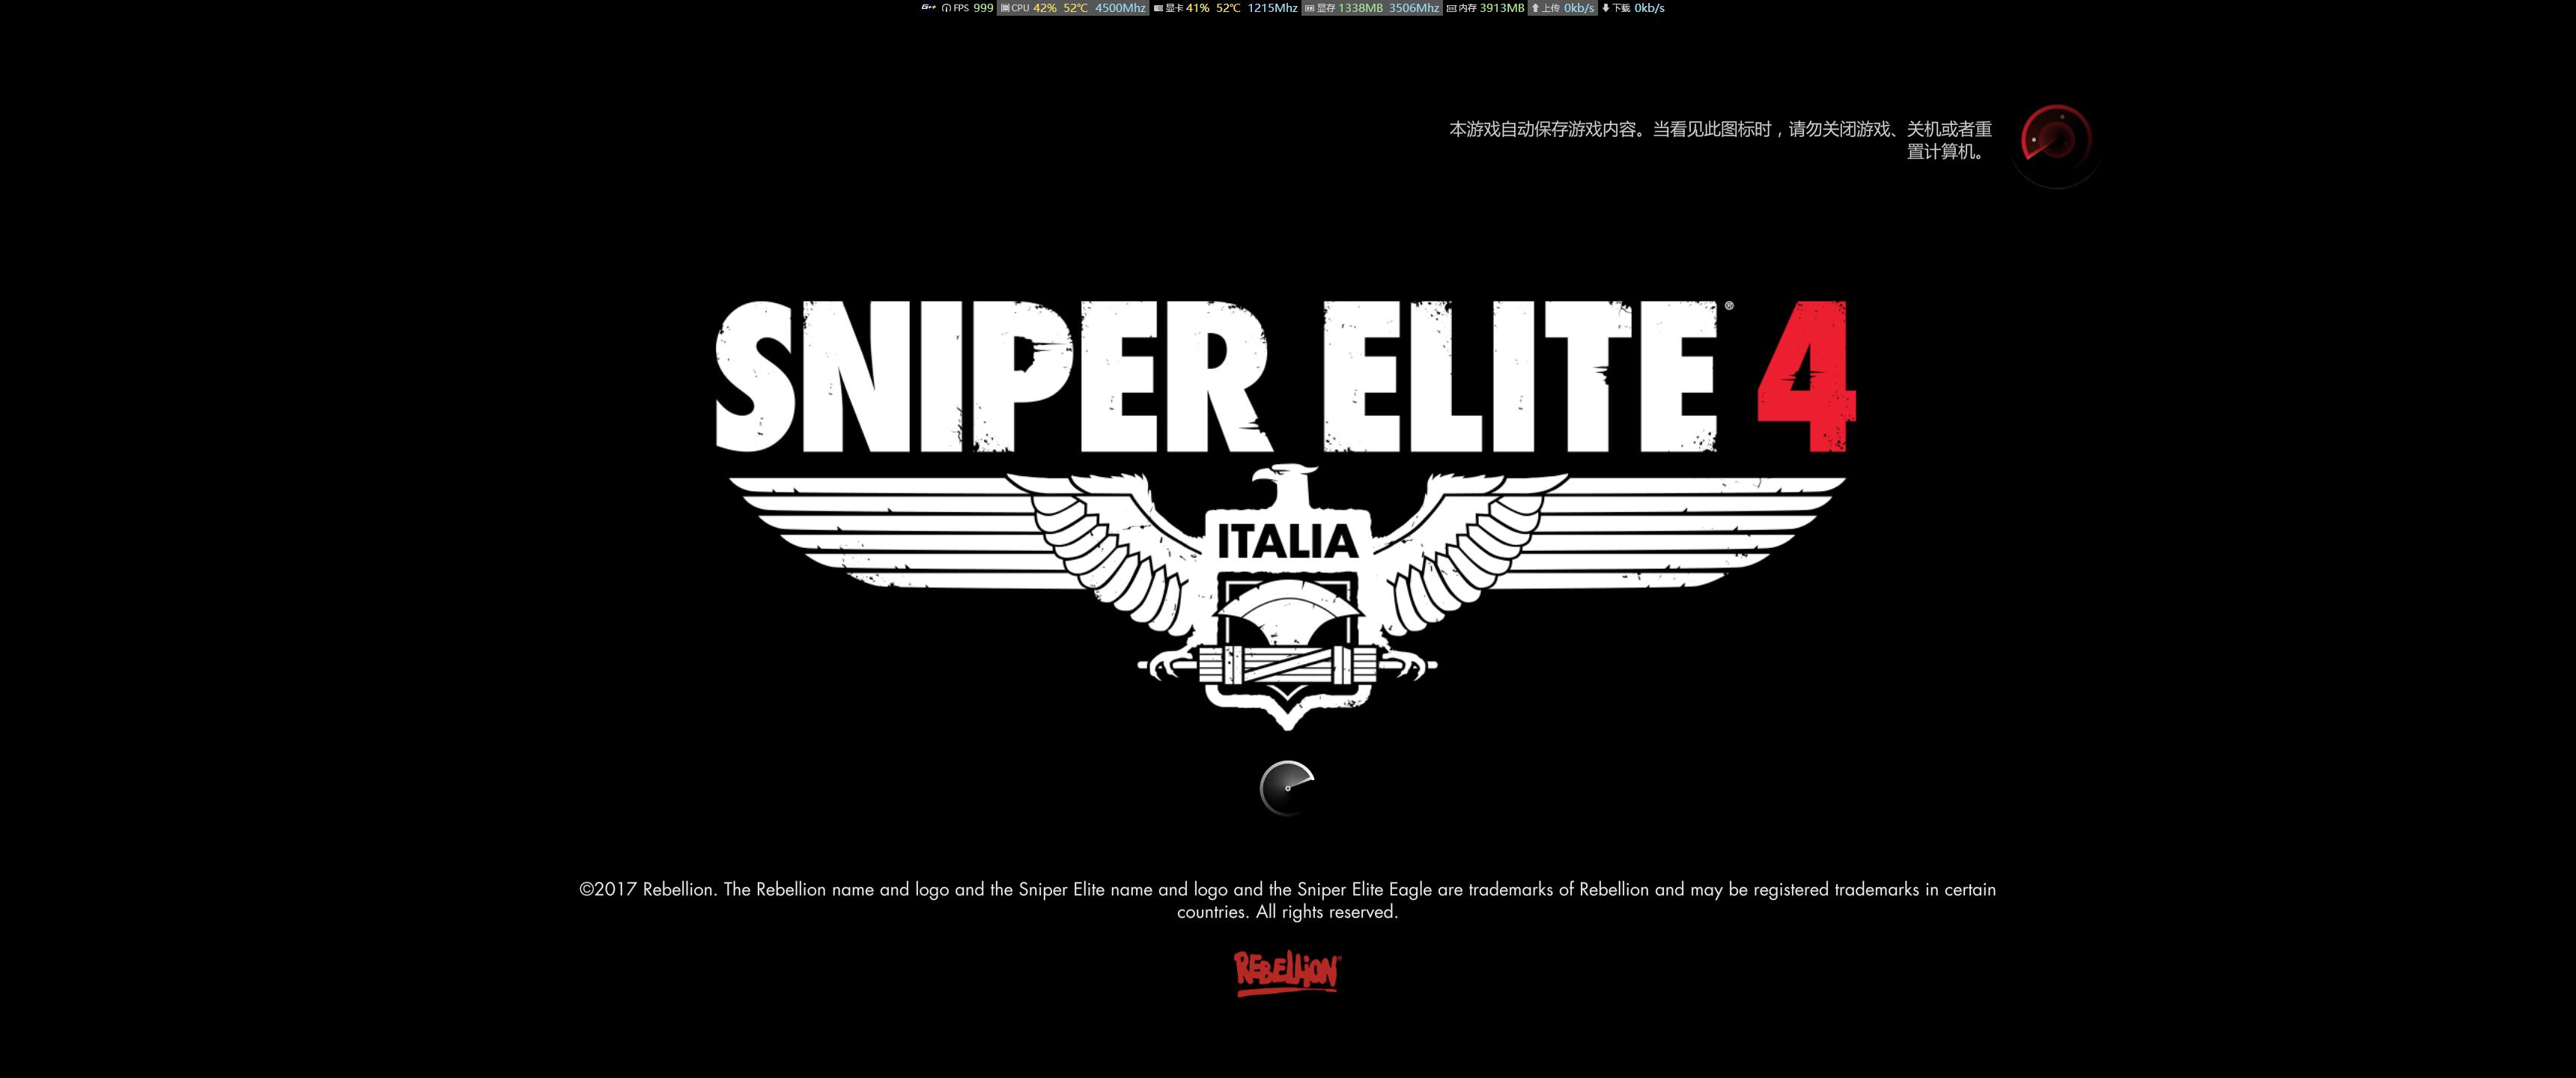 SniperElite4_DX11-01-20-33-15.jpg